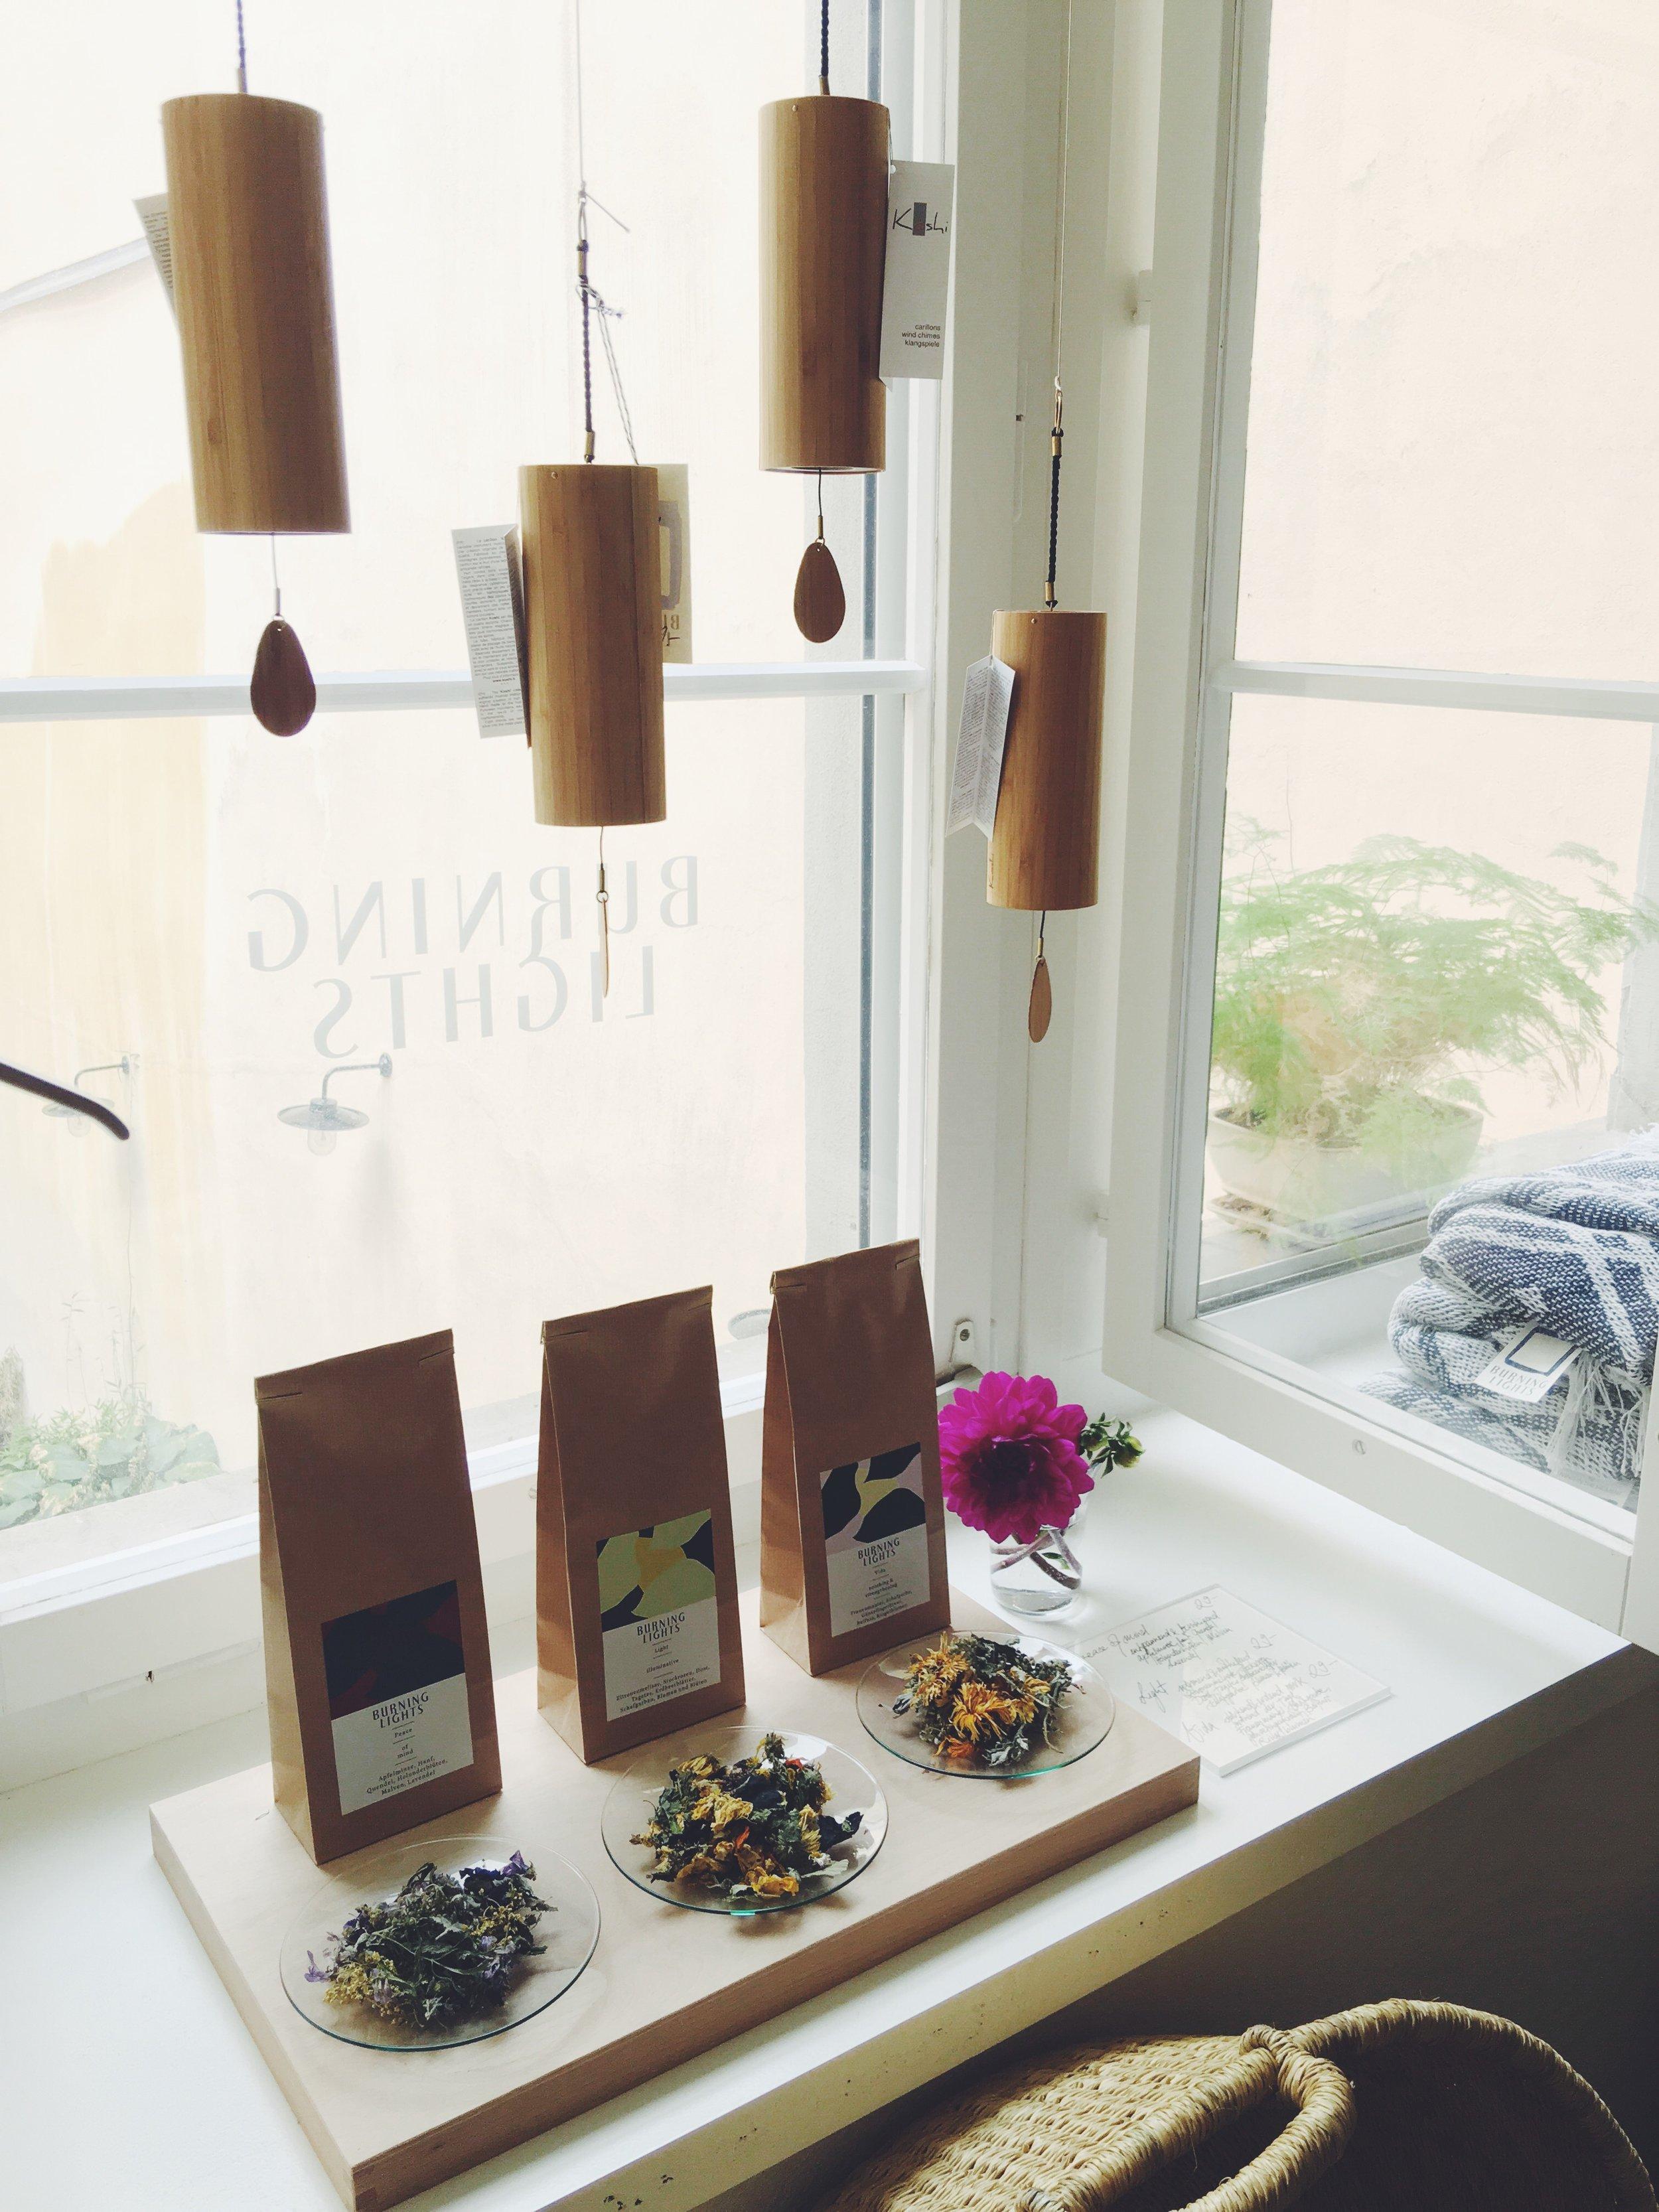 Tea Peace of mind, Light, Vida Burninglights, Koshi Chimes